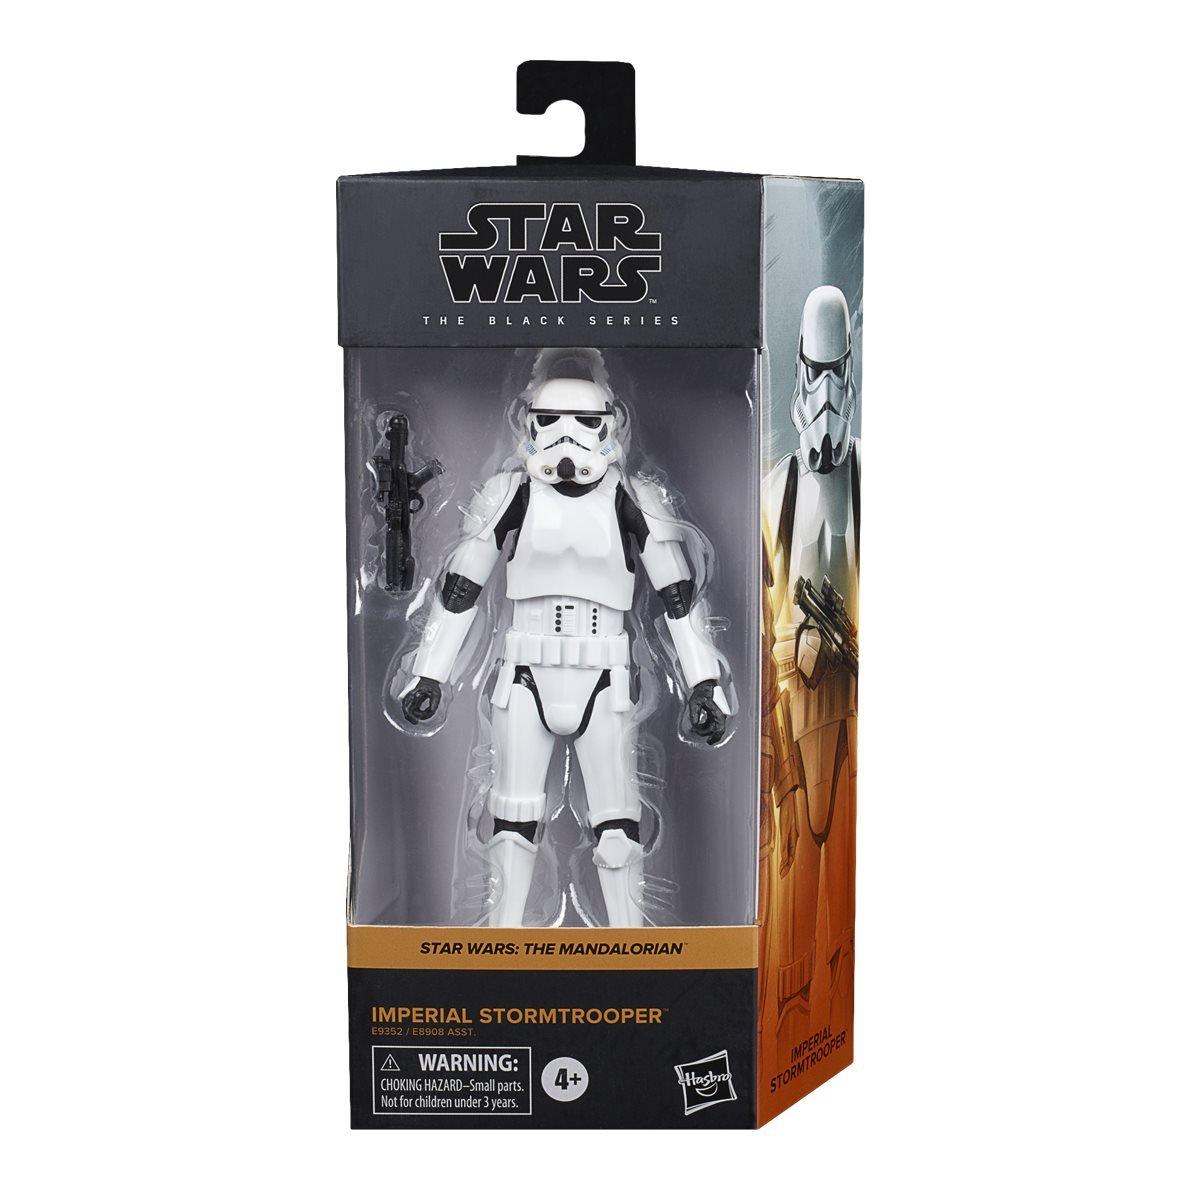 Star Wars The Black Series Imperial Stormtrooper Figure画像